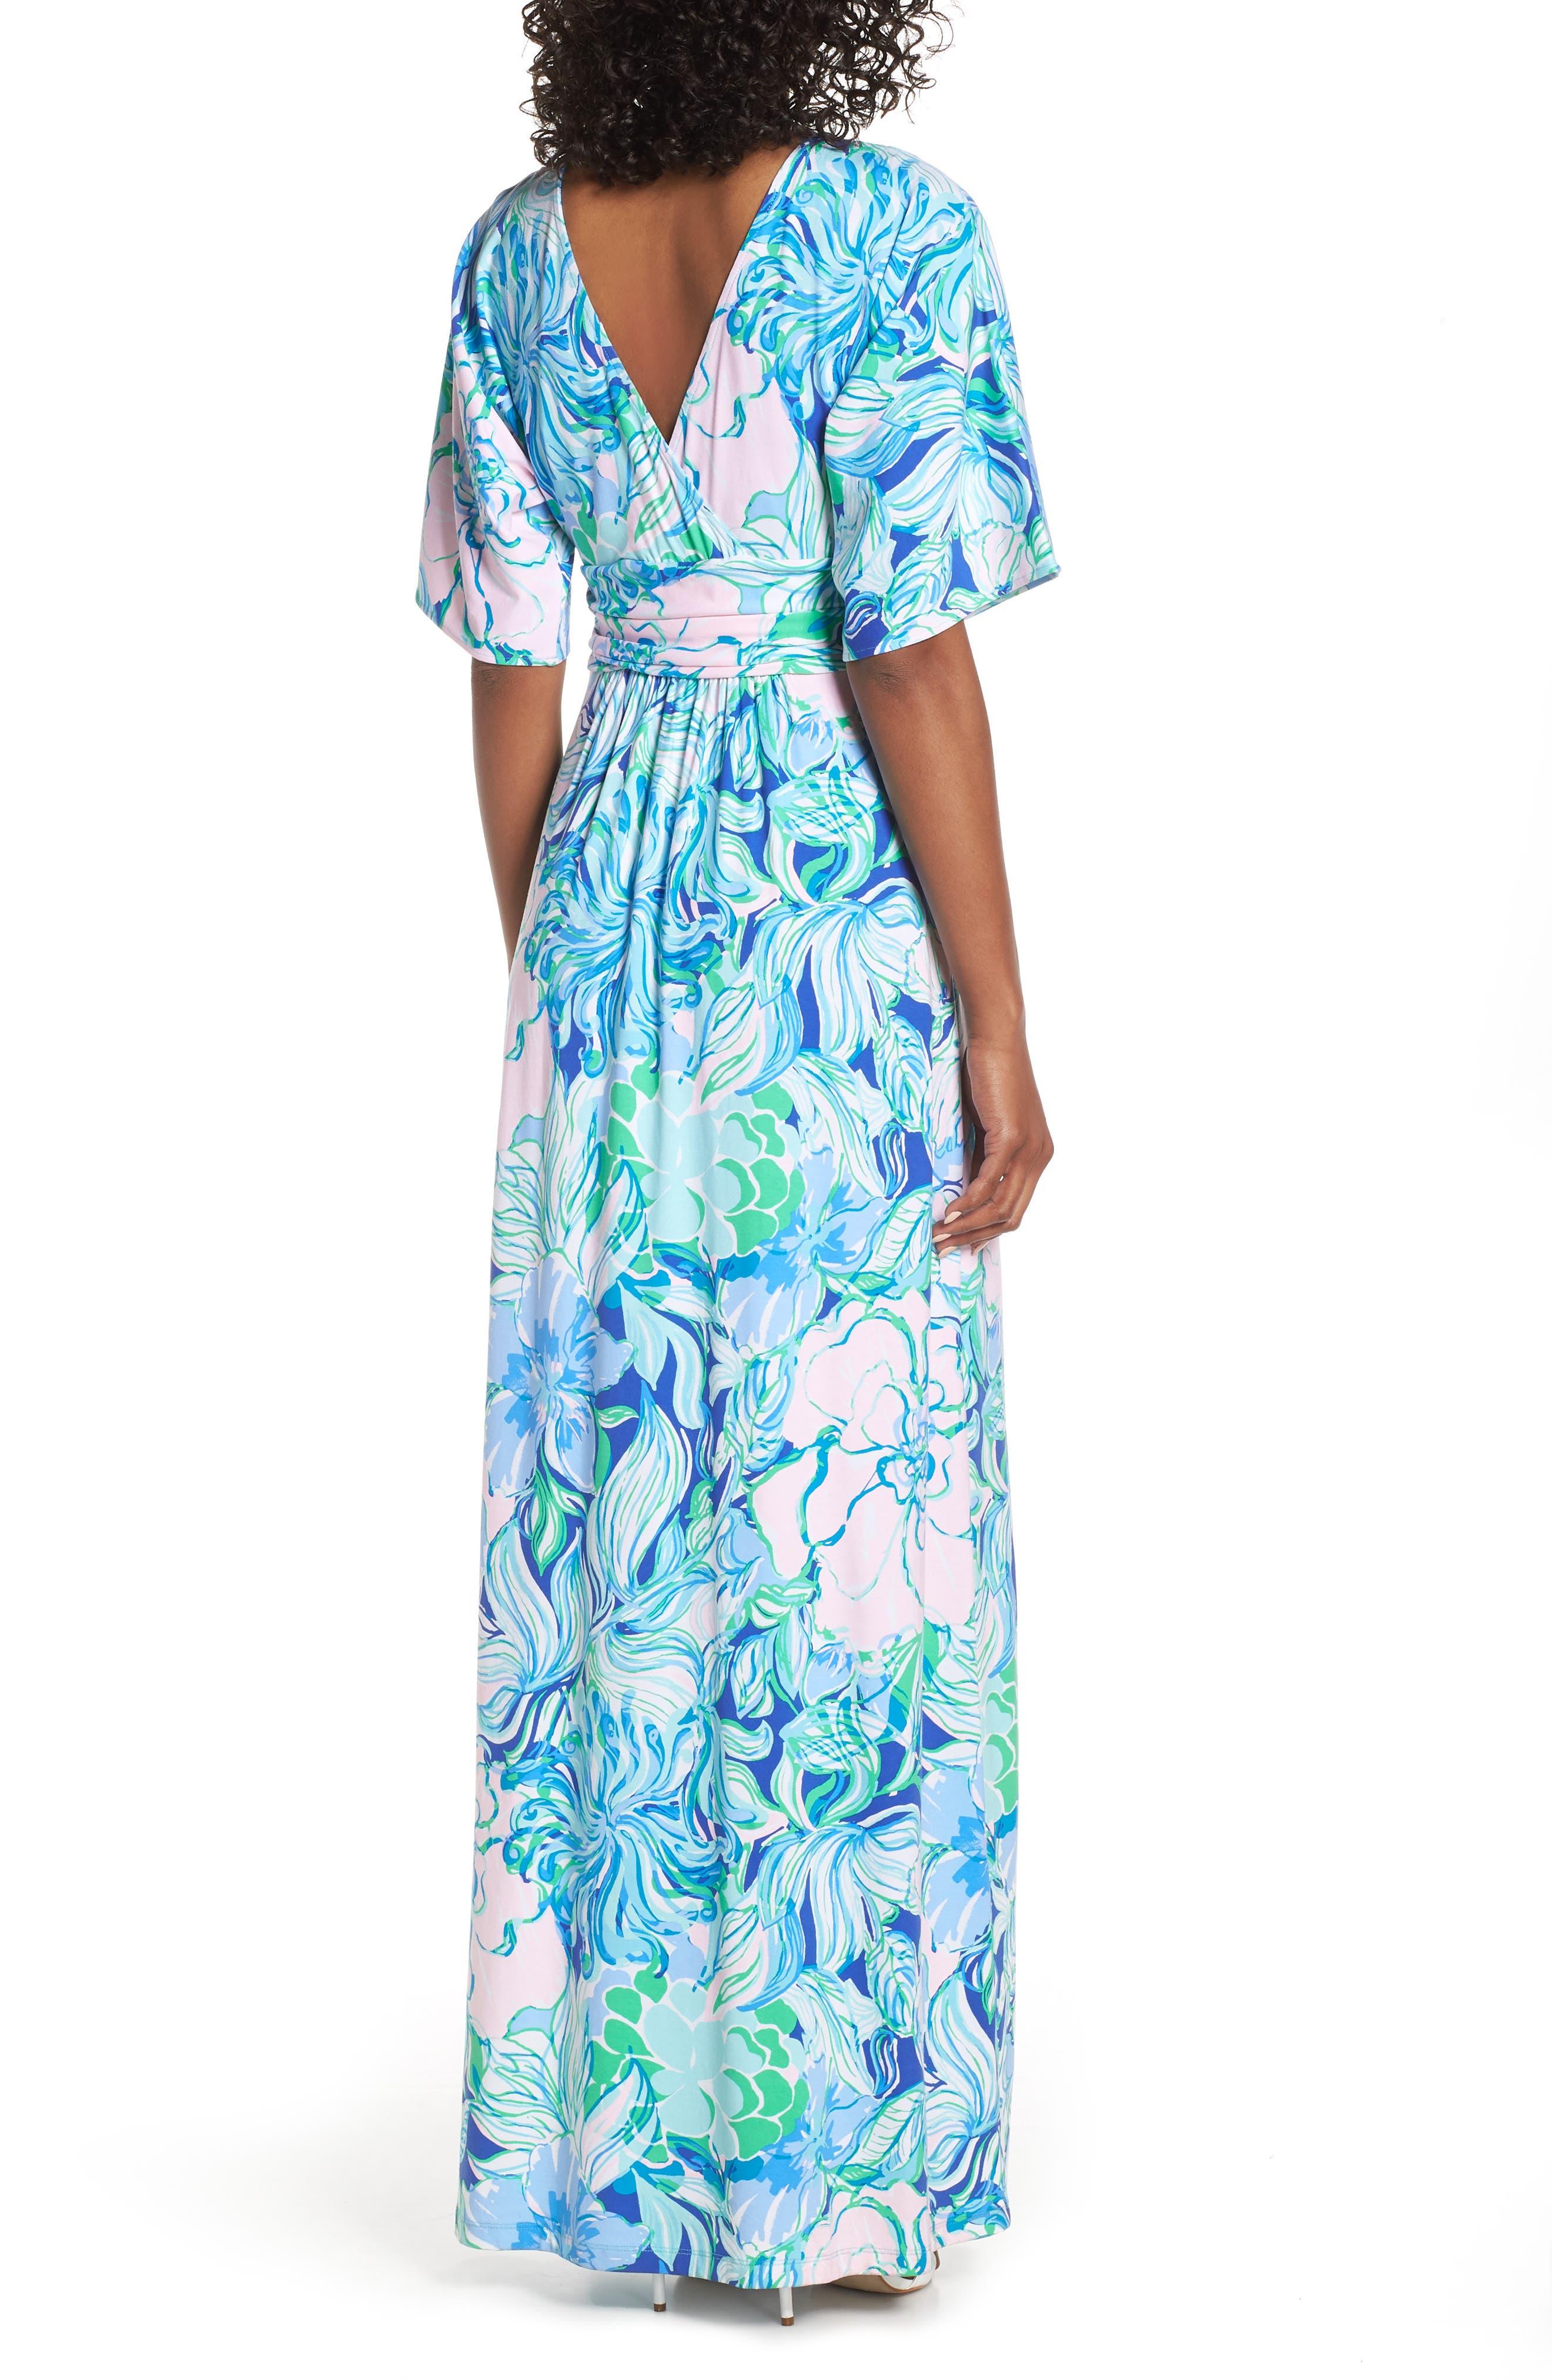 LILLY PULITZER<SUP>®</SUP>, Parigi Maxi Dress, Alternate thumbnail 2, color, MULTI PARTY THYME